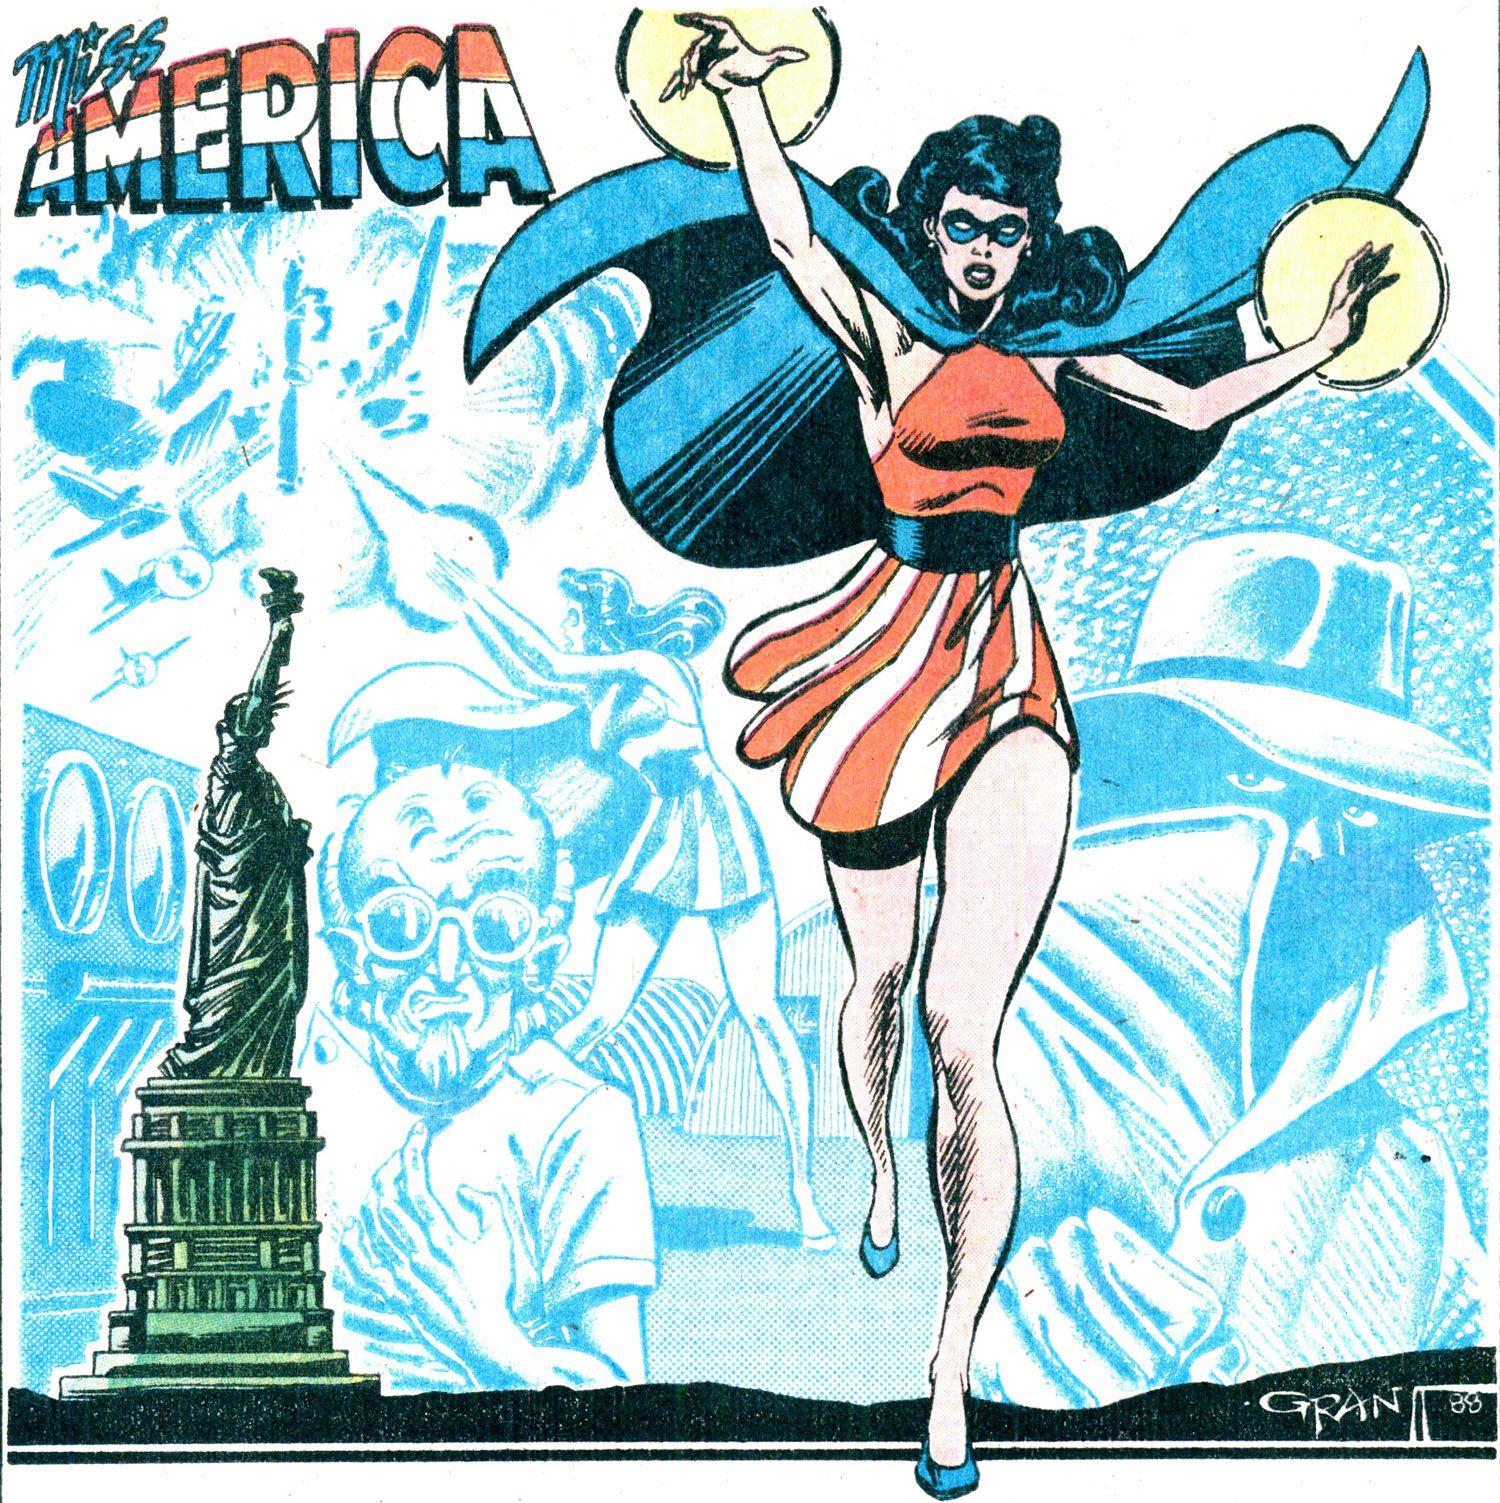 Miss america original freedom fighters comic stuff freedom fighters pinterest freedom fighters